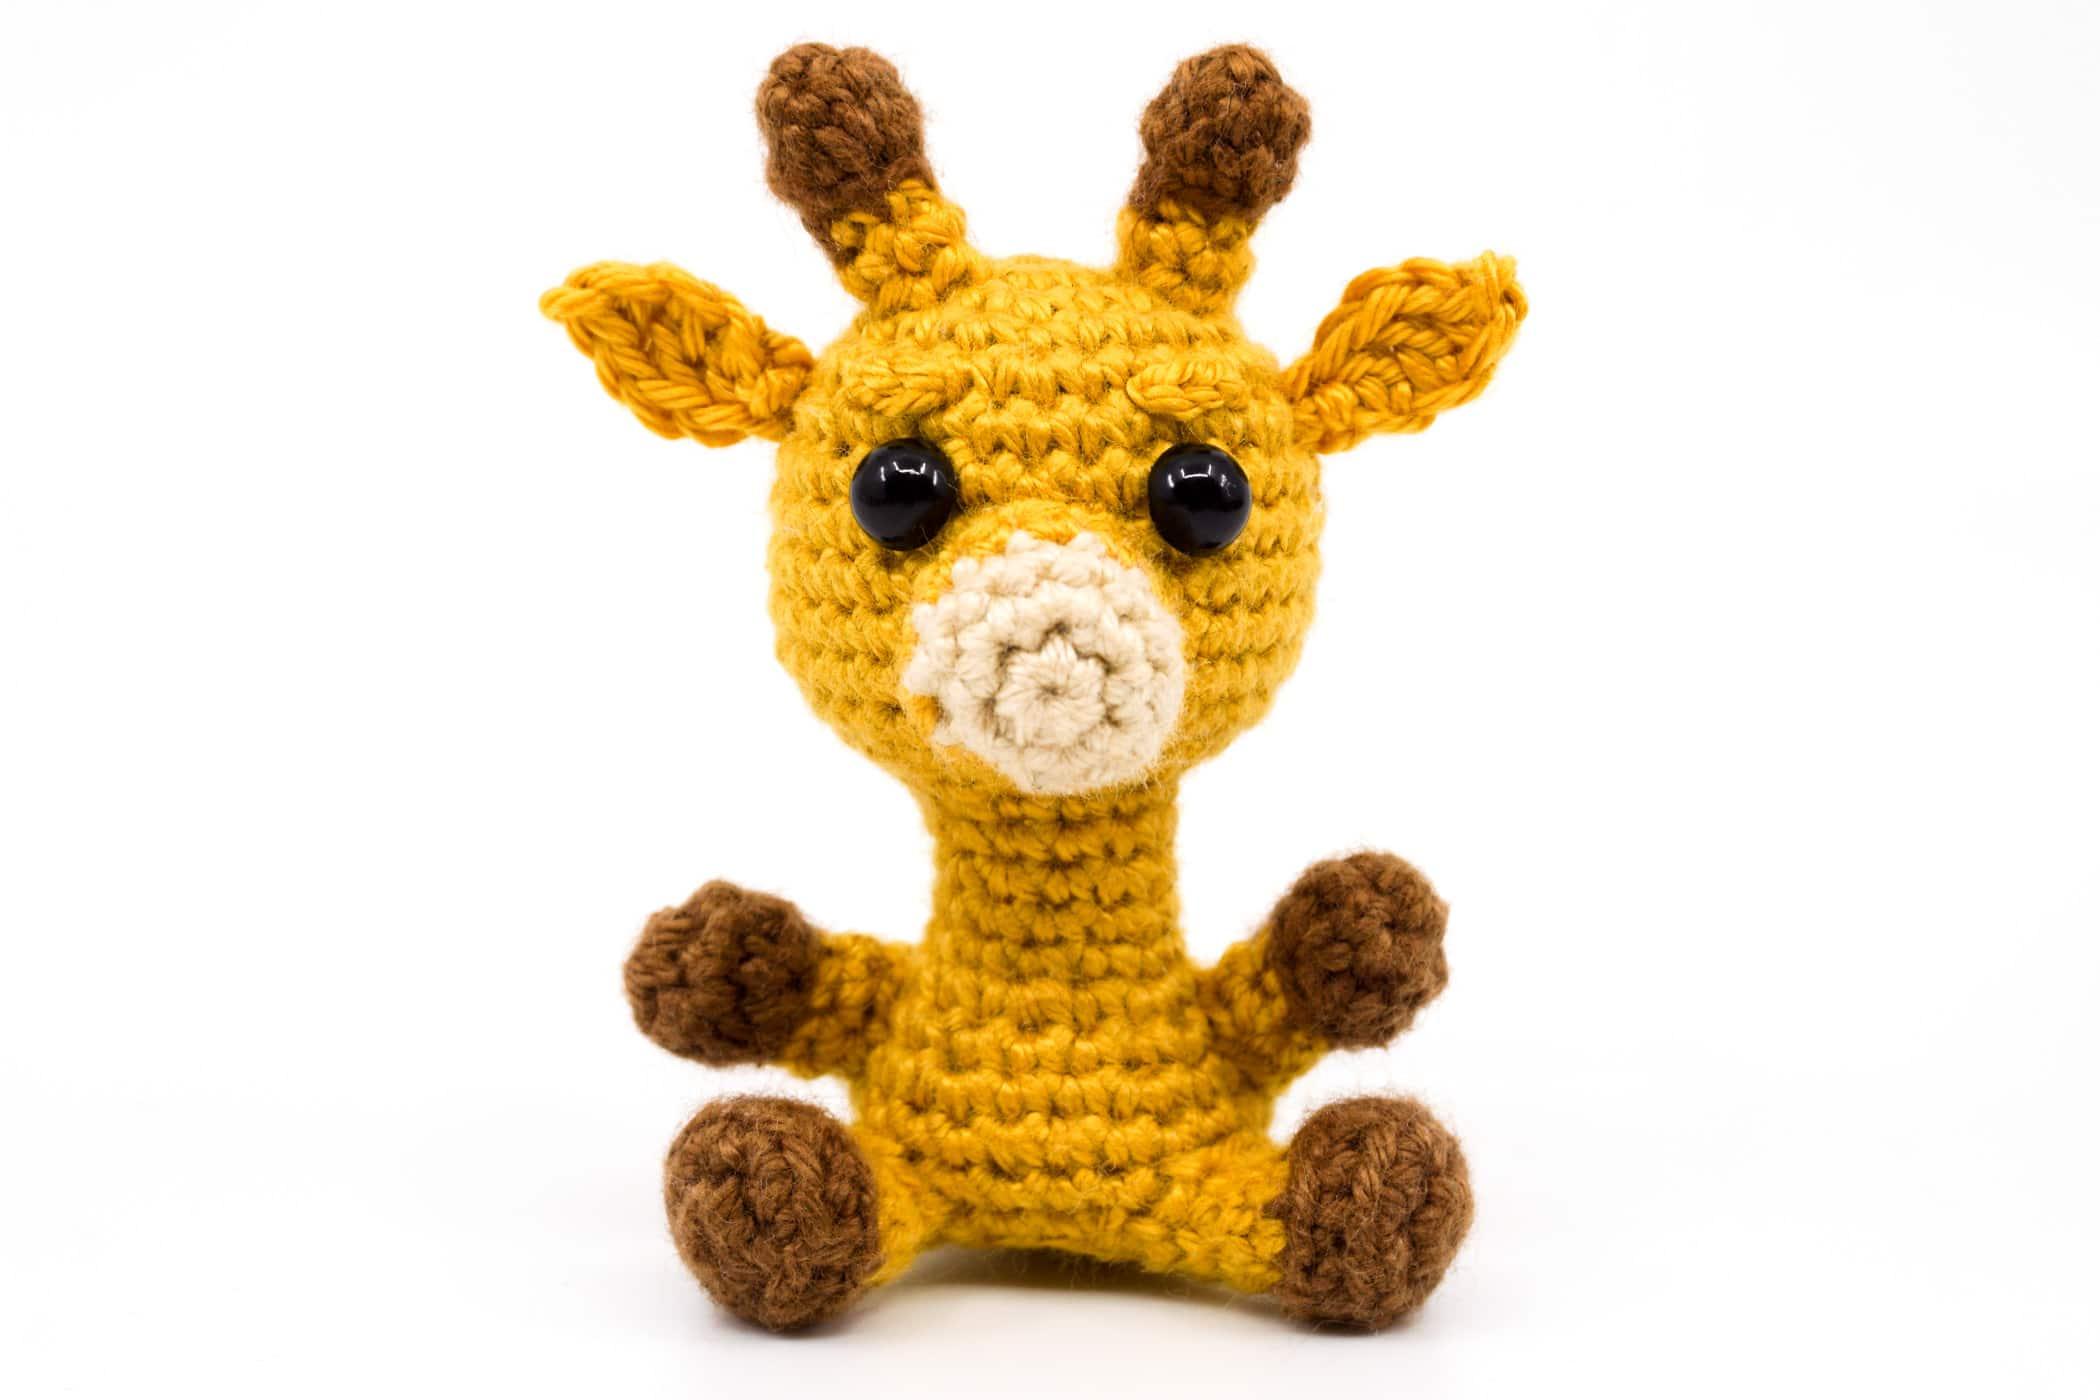 Crochet Baby Giraffe Amigurumi Free Patterns | 1400x2100